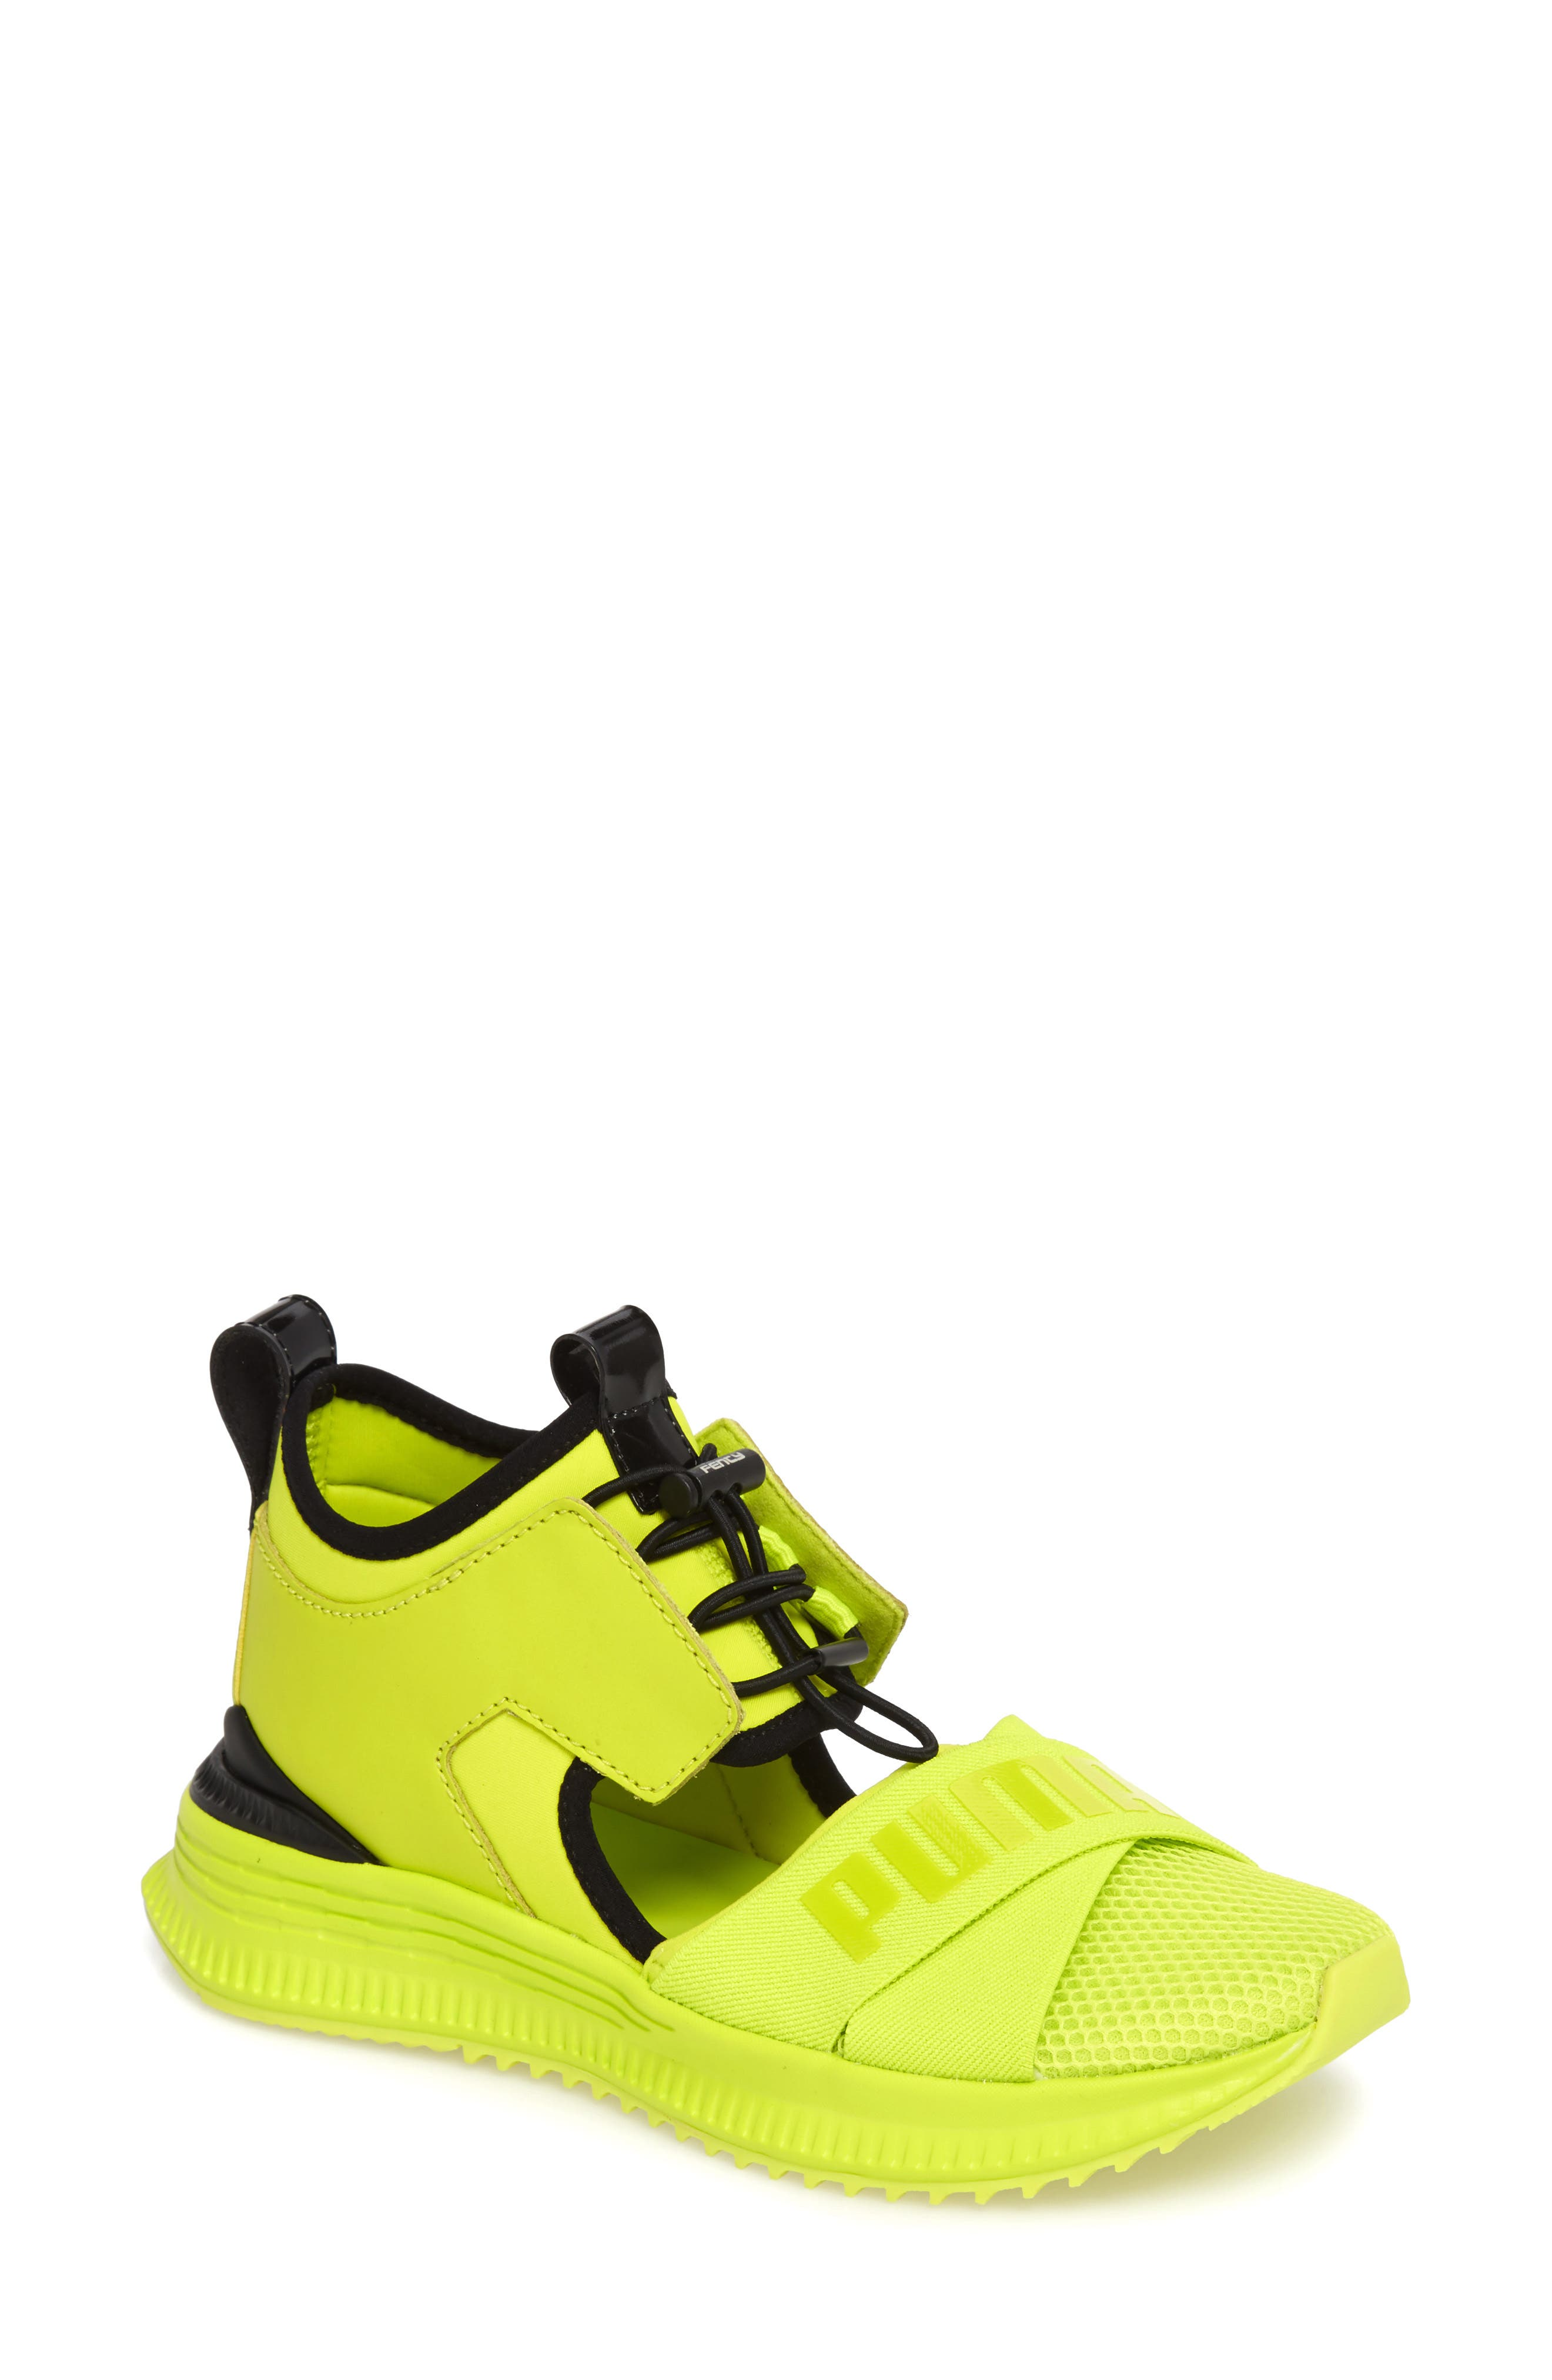 FENTY PUMA by Rihanna Avid Sneaker,                             Main thumbnail 1, color,                             Lime Punch/ Black/ Lime Punch